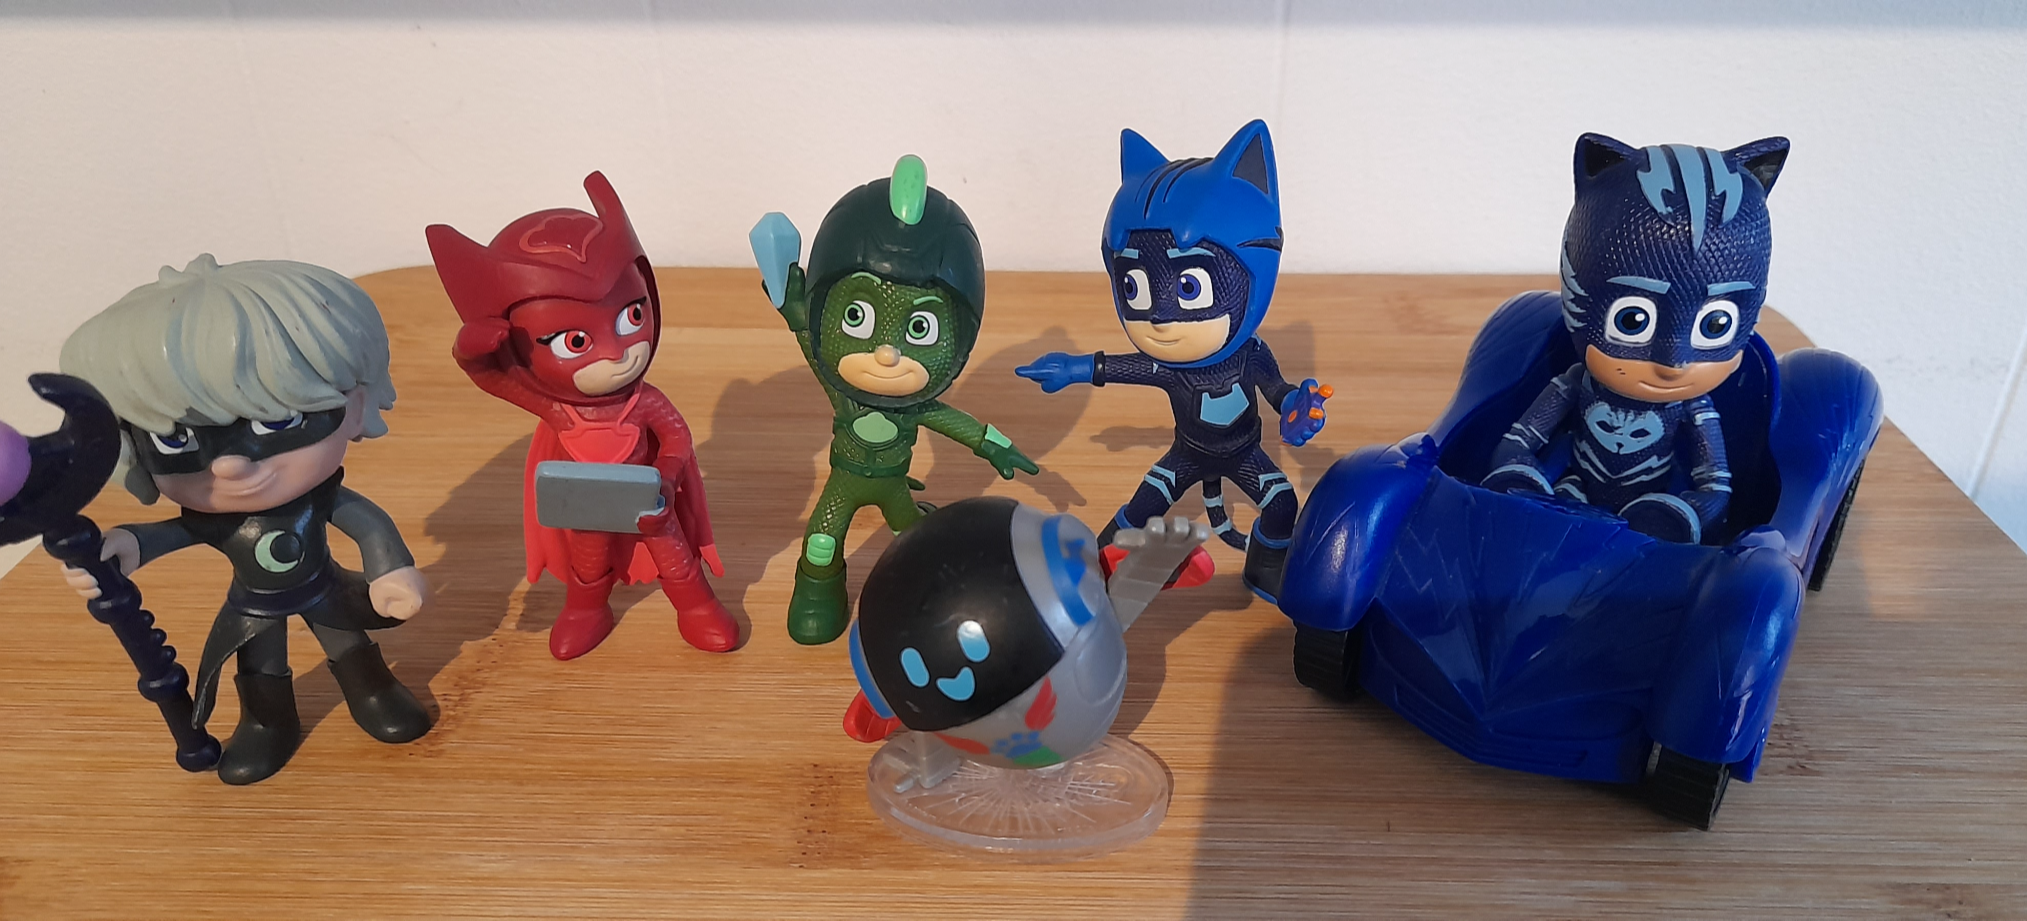 PJ Masks Play Set and Figures